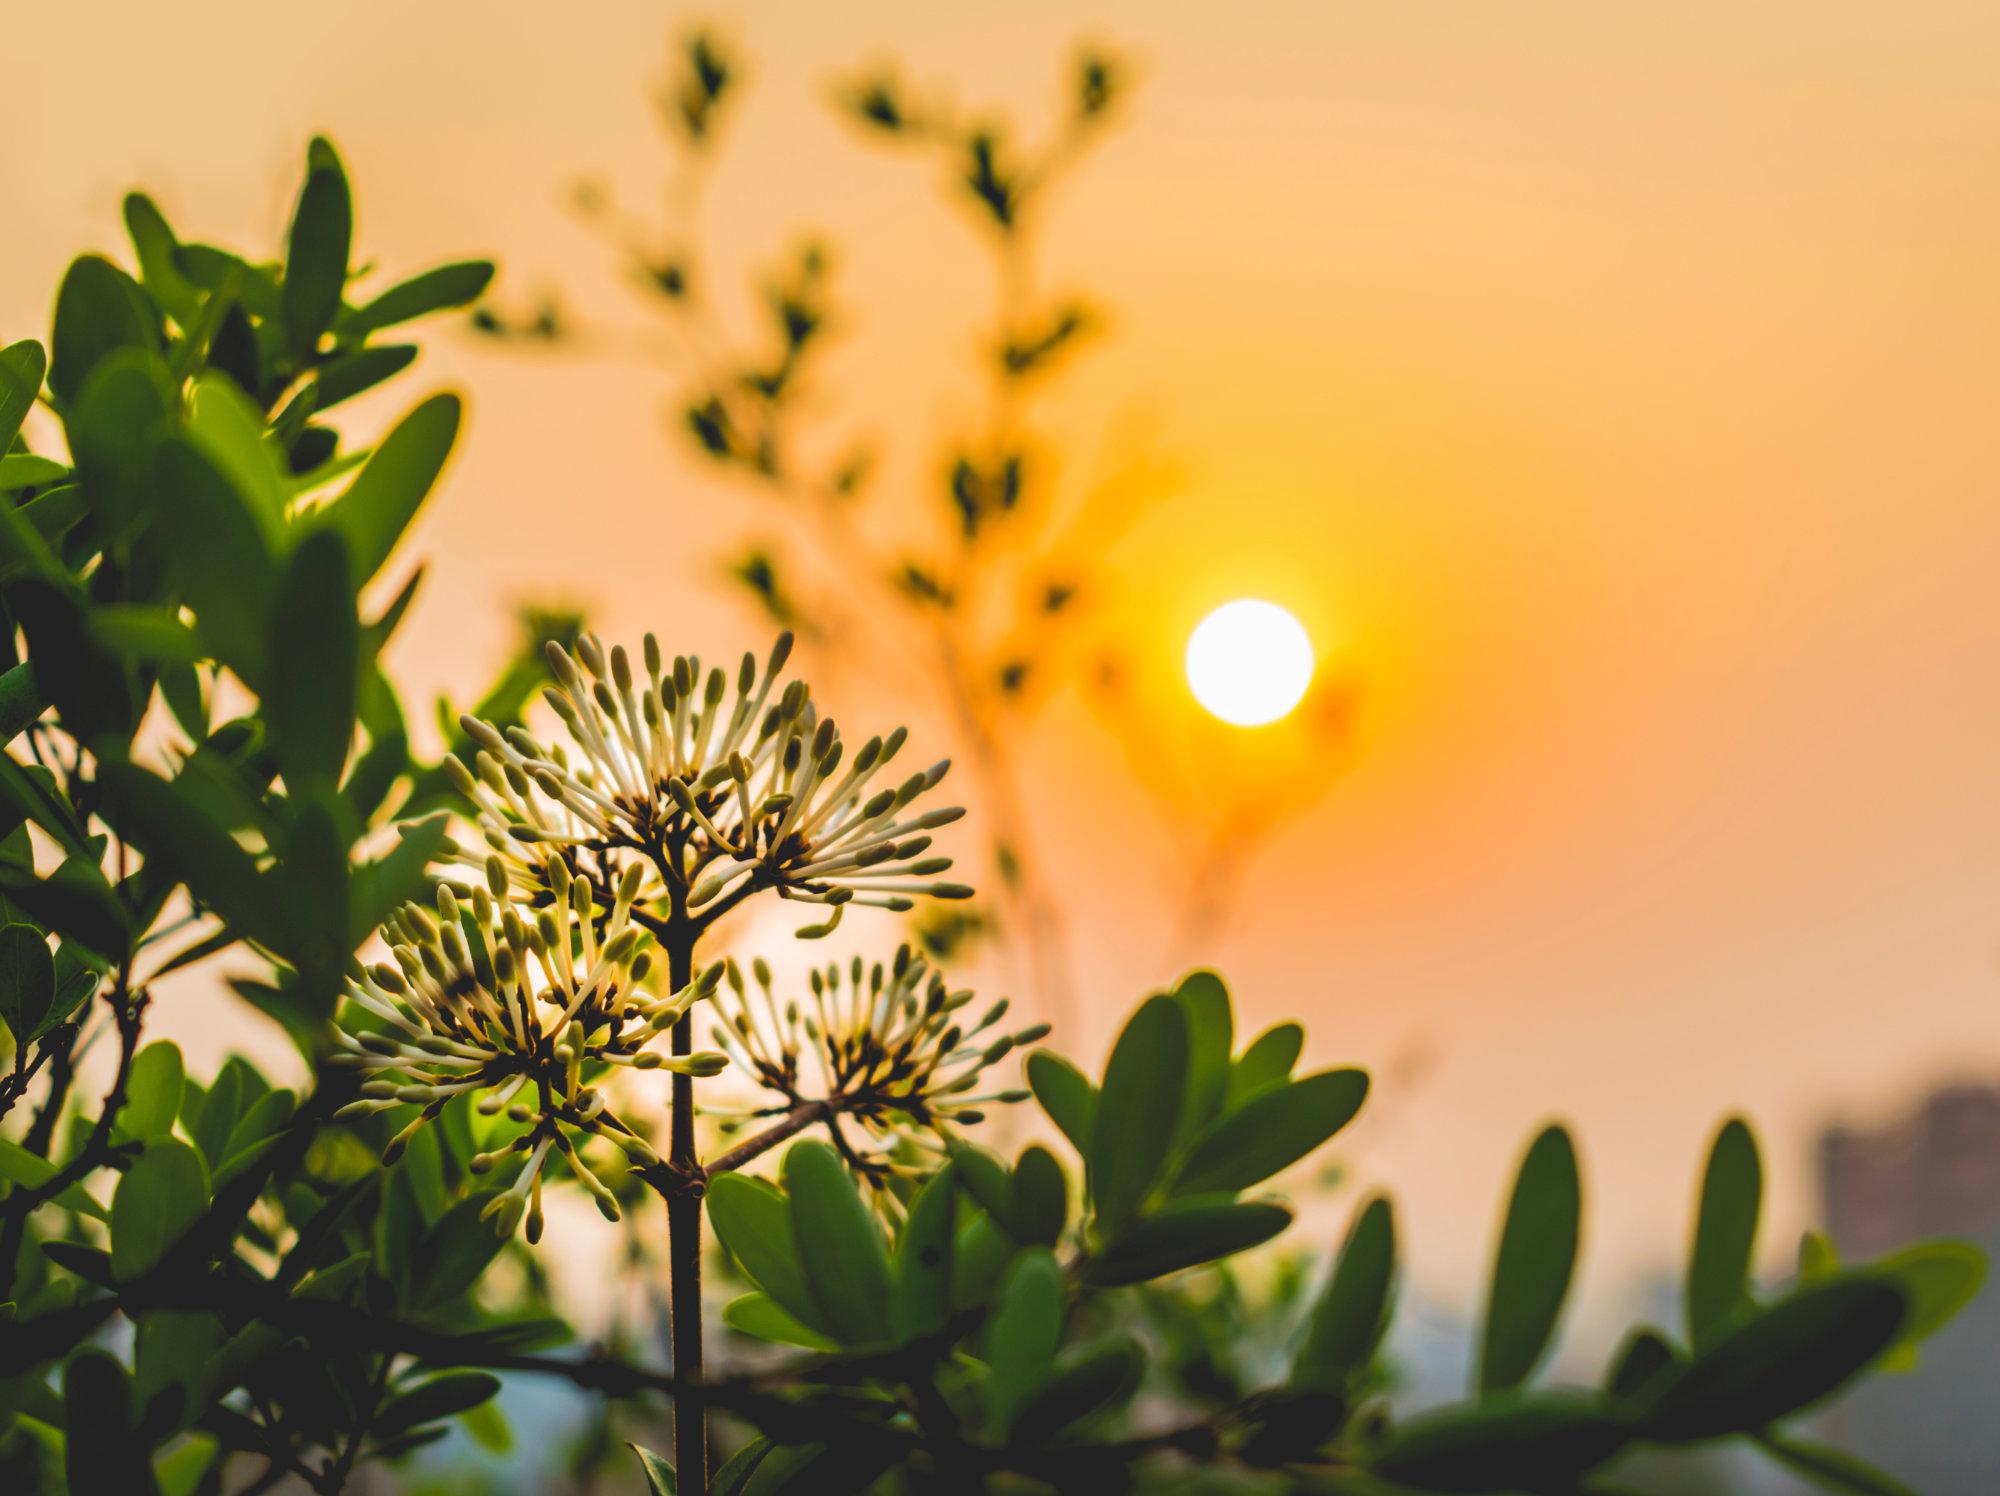 Hope in a new dawn